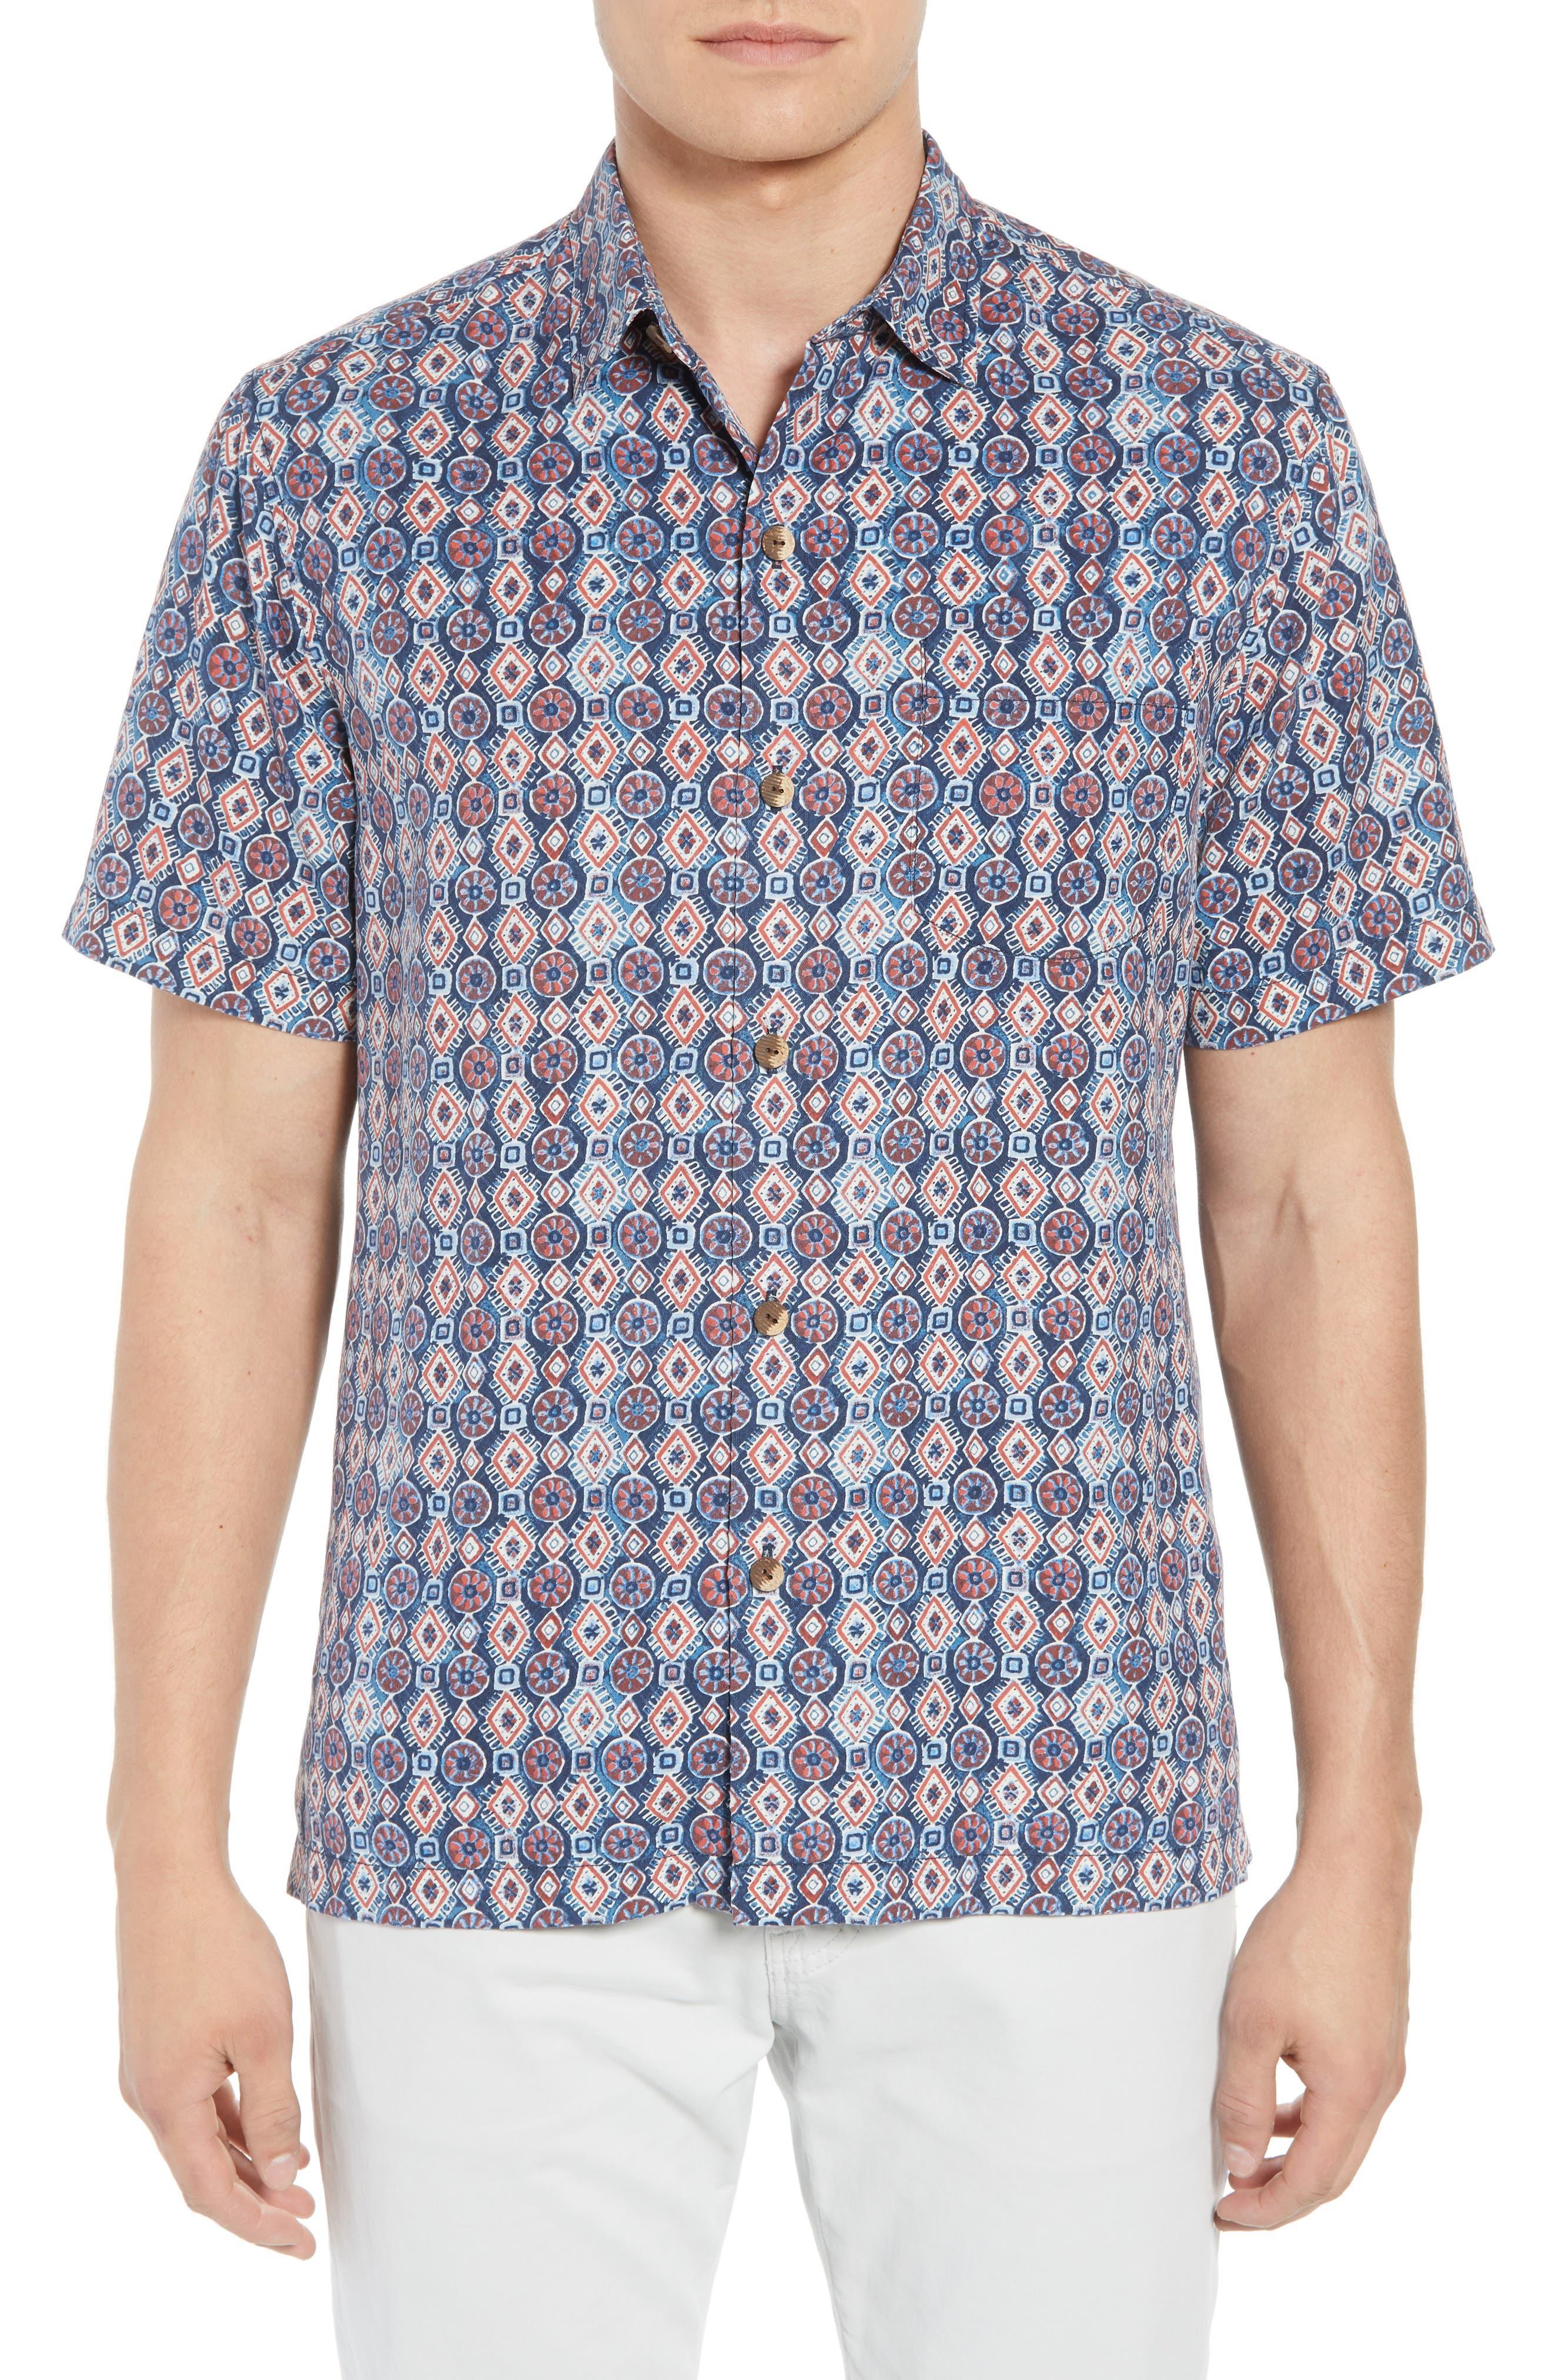 TOMMY BAHAMA Tulum Tiles Silk Camp Shirt, Main, color, 400